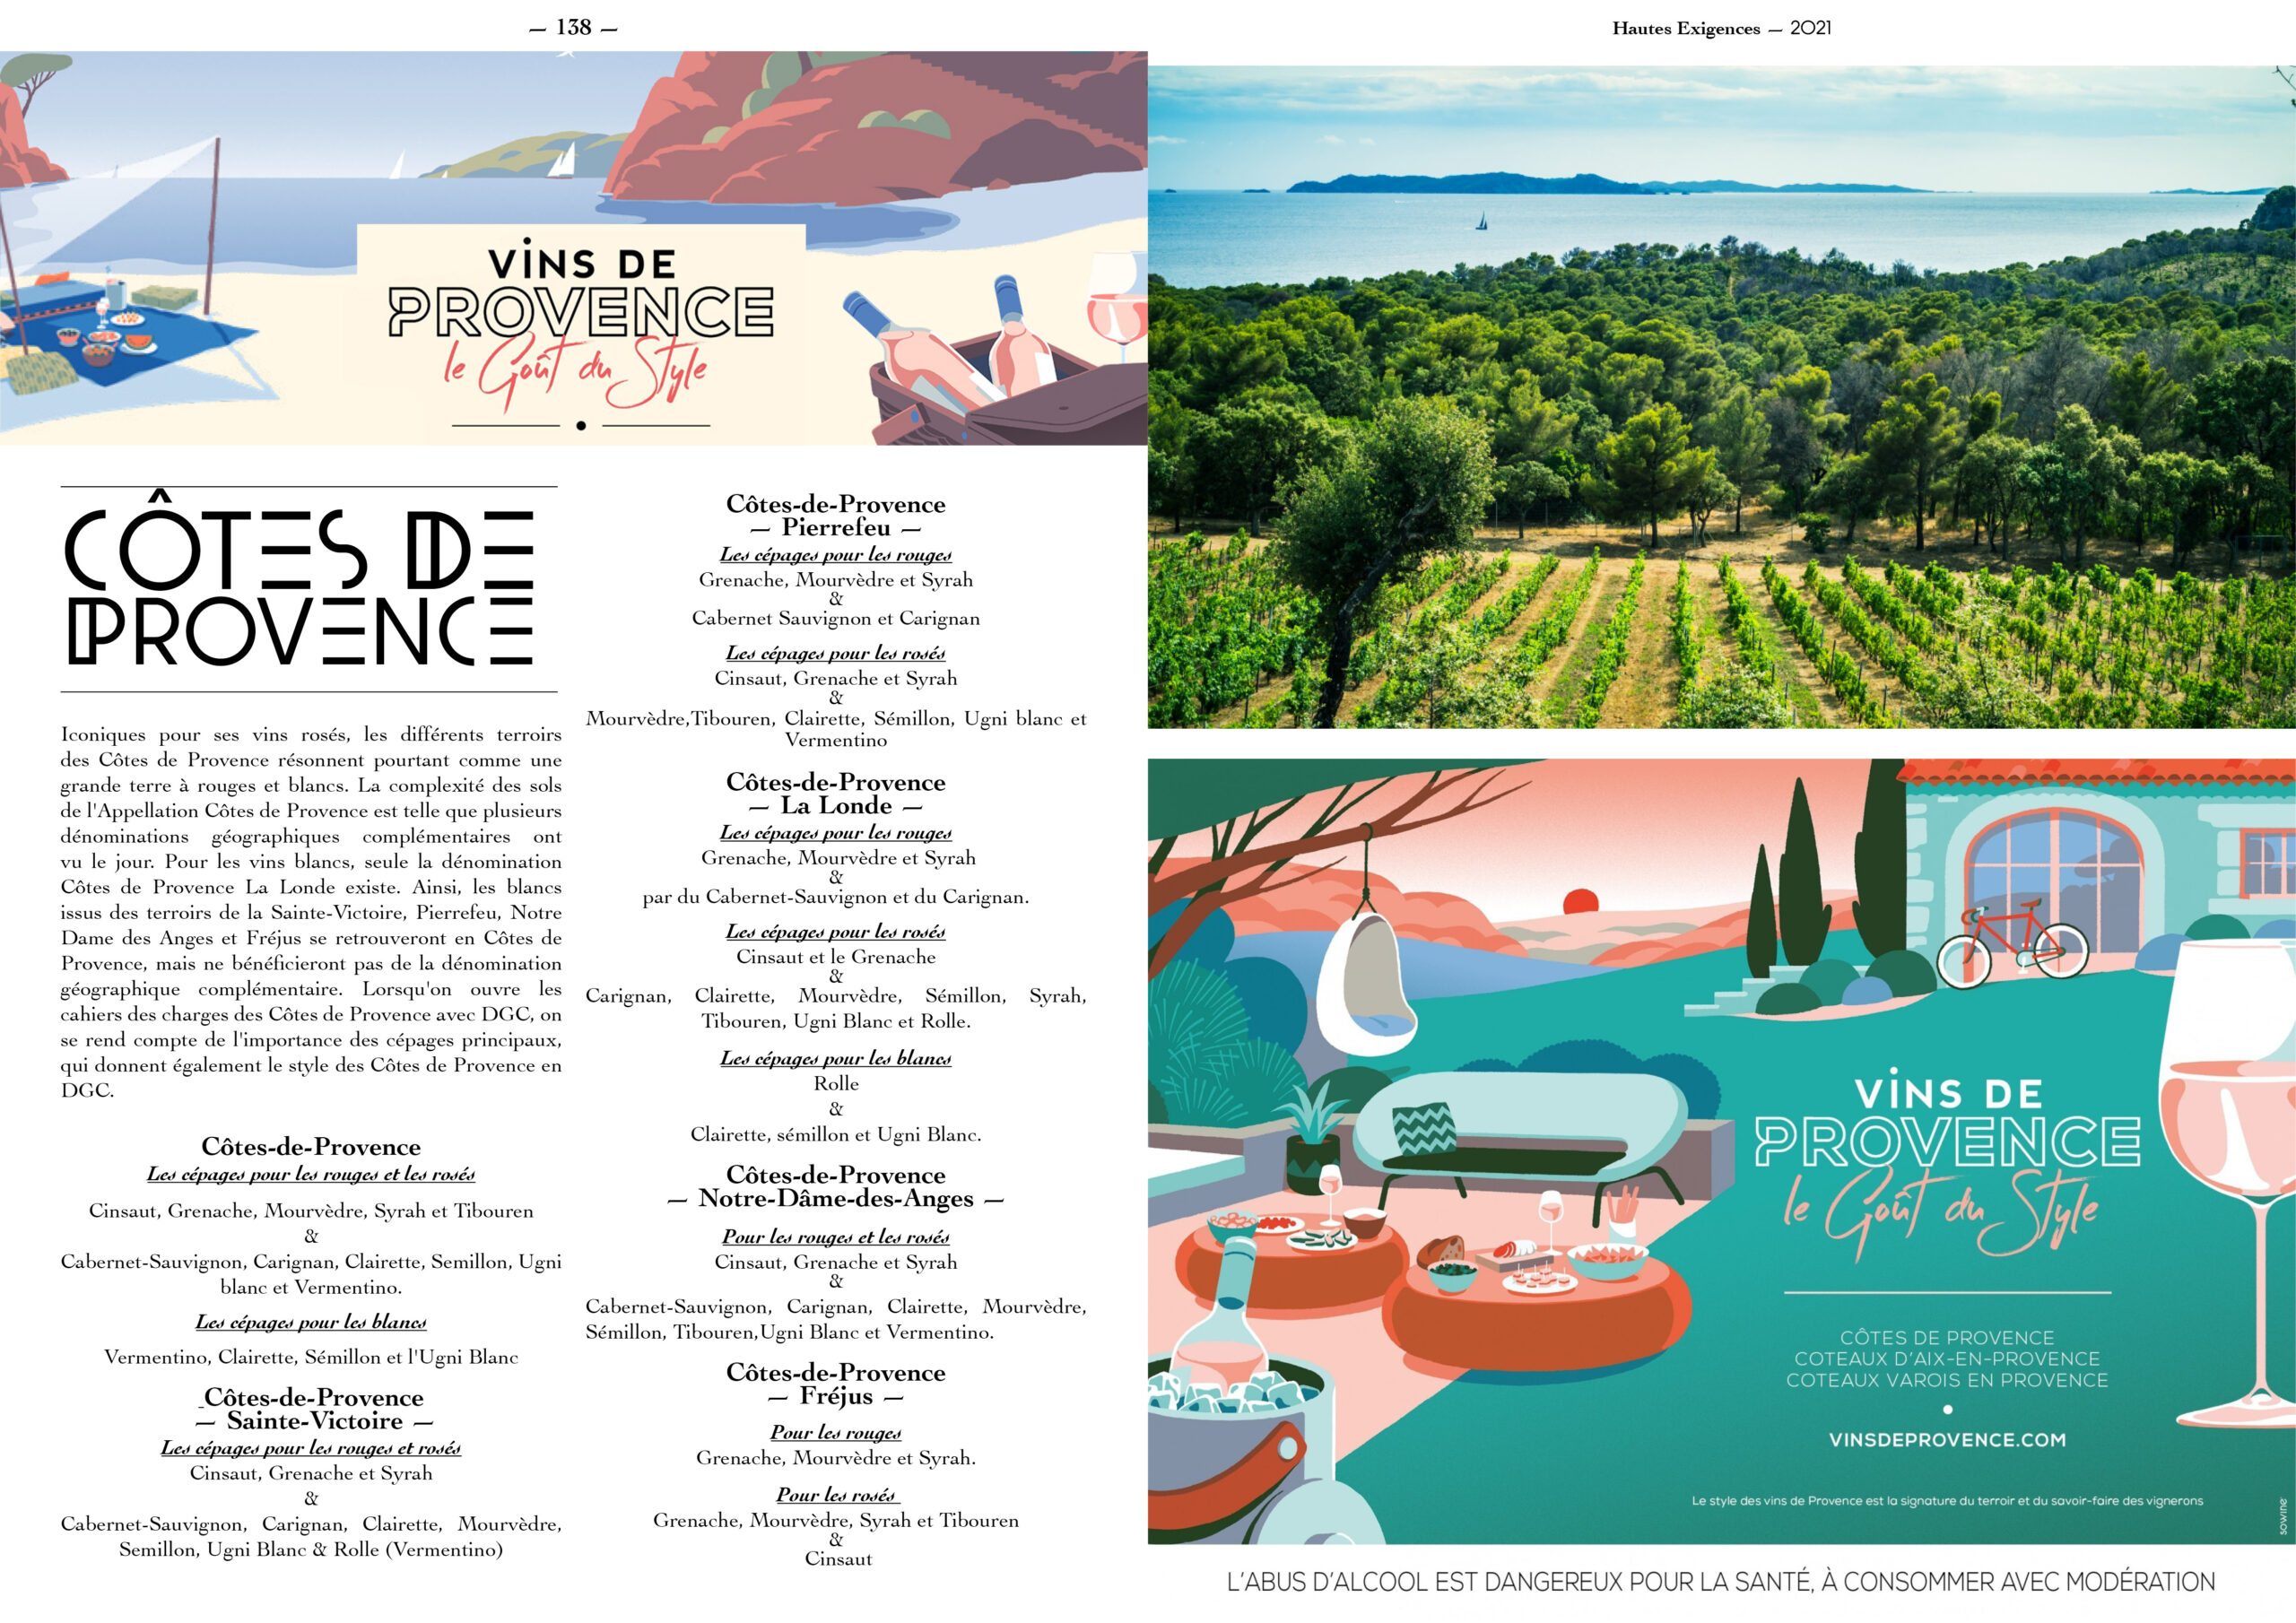 Hautes Exigences Magazine Hors Serie 2021 page 136-137